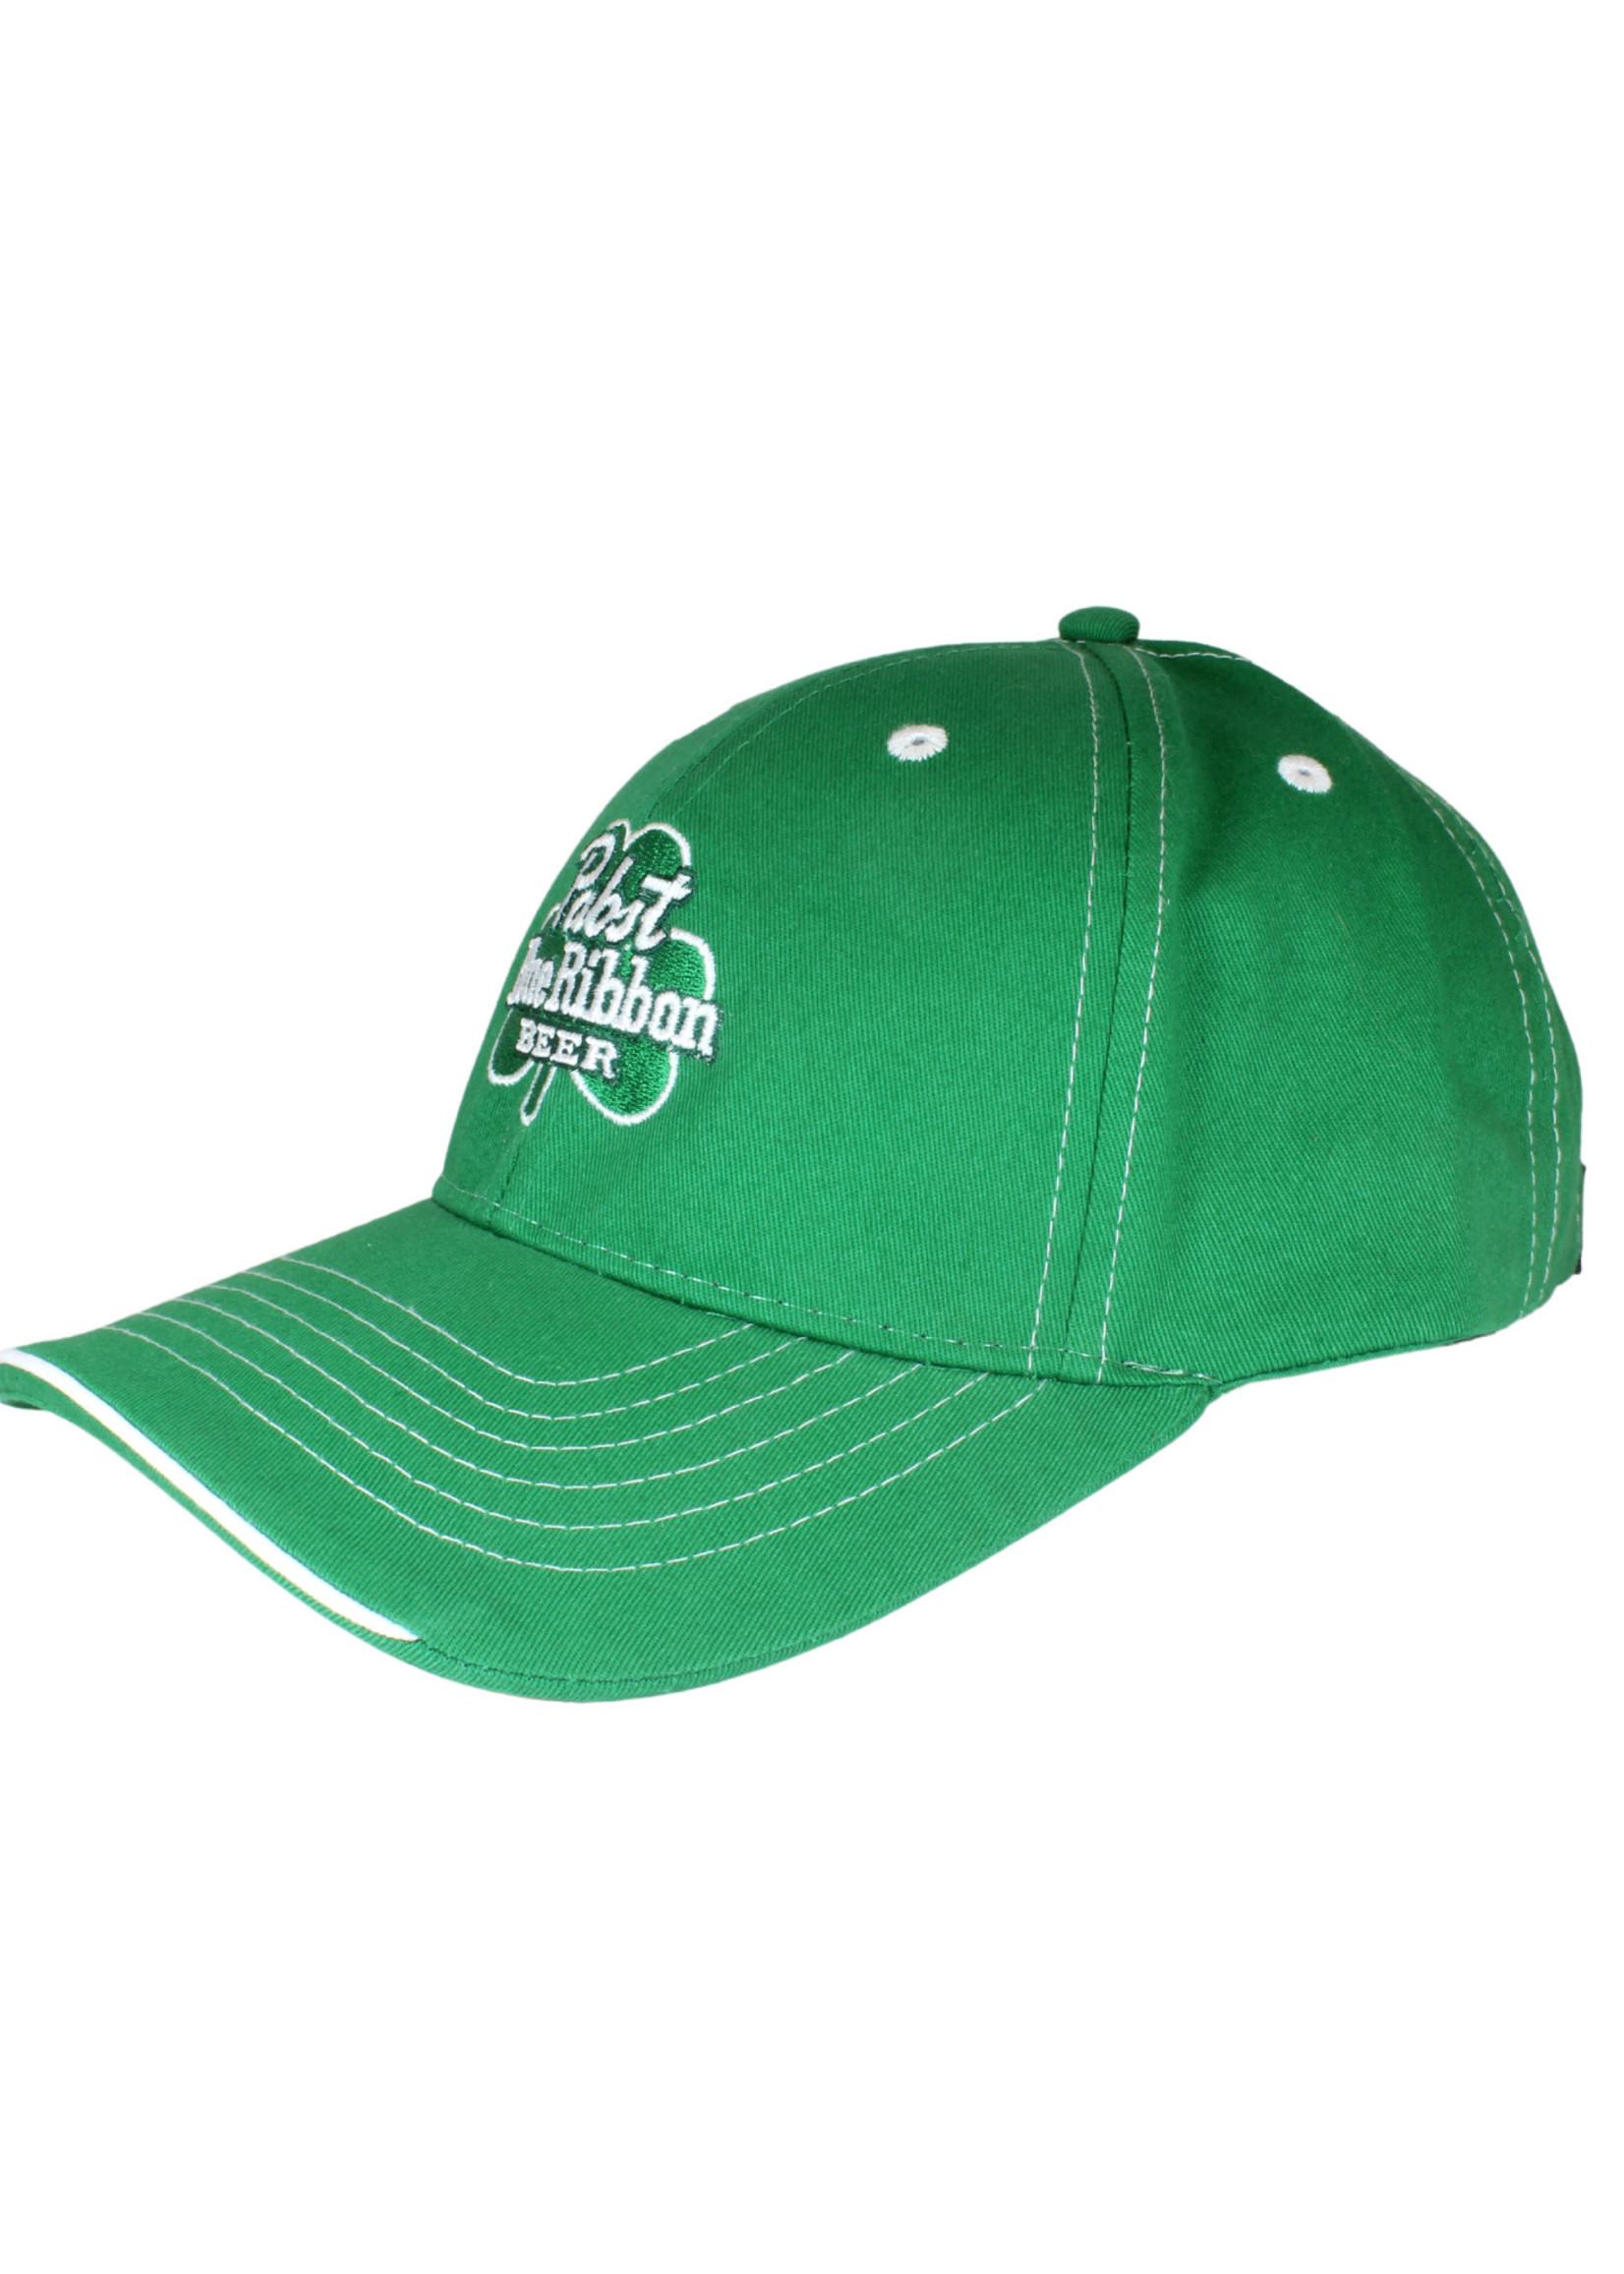 Pabst Pabst Shamrock Cotton Cap